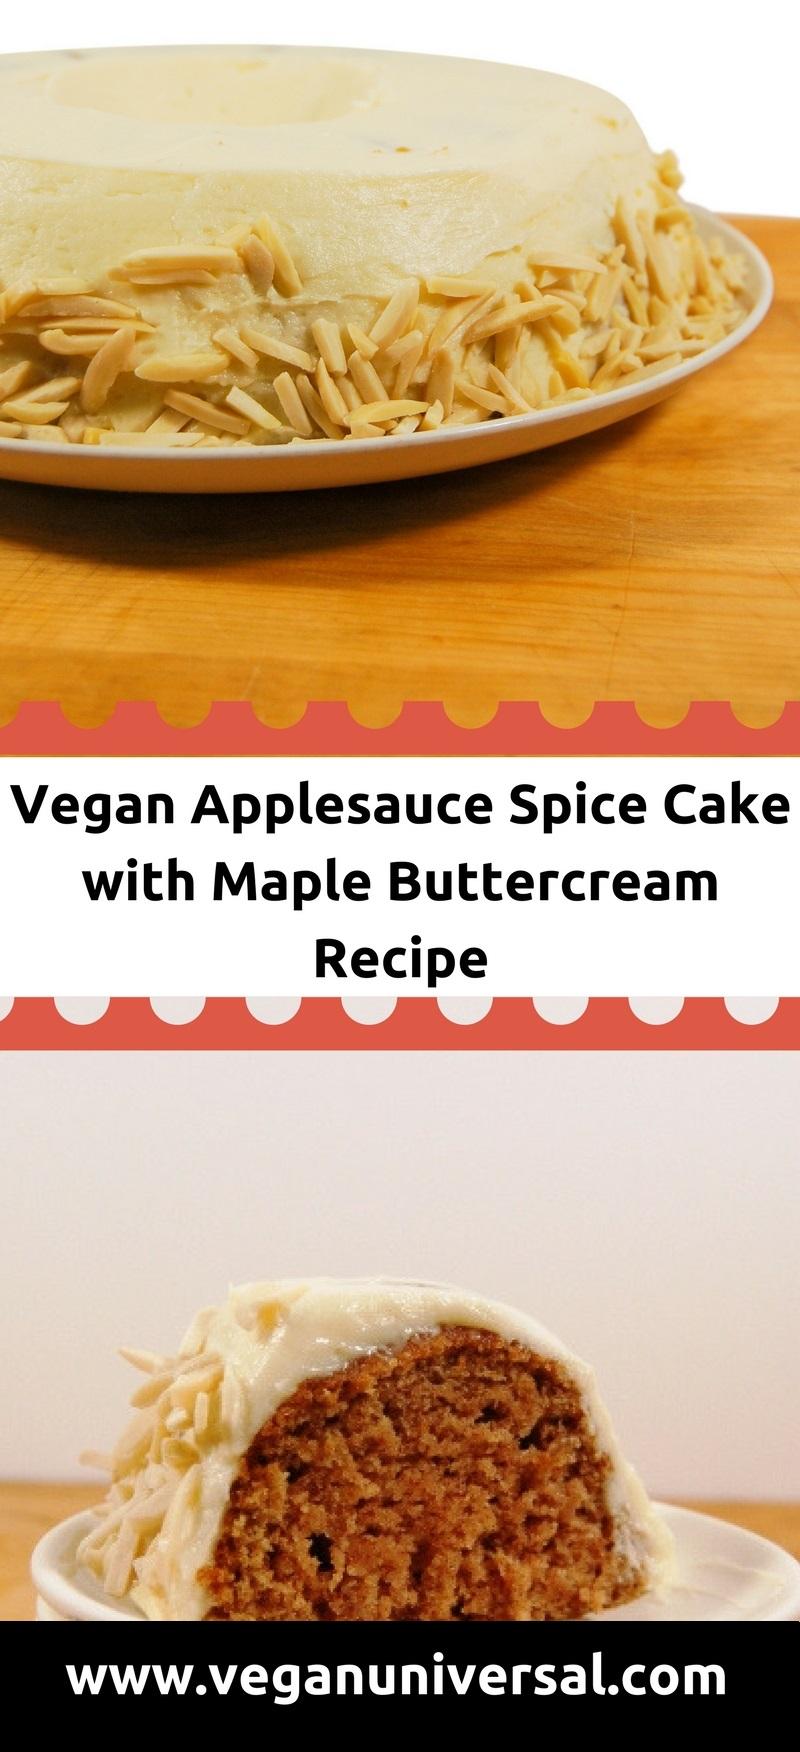 Vegan Applesauce Spice Cake with Maple Buttercream Recipe